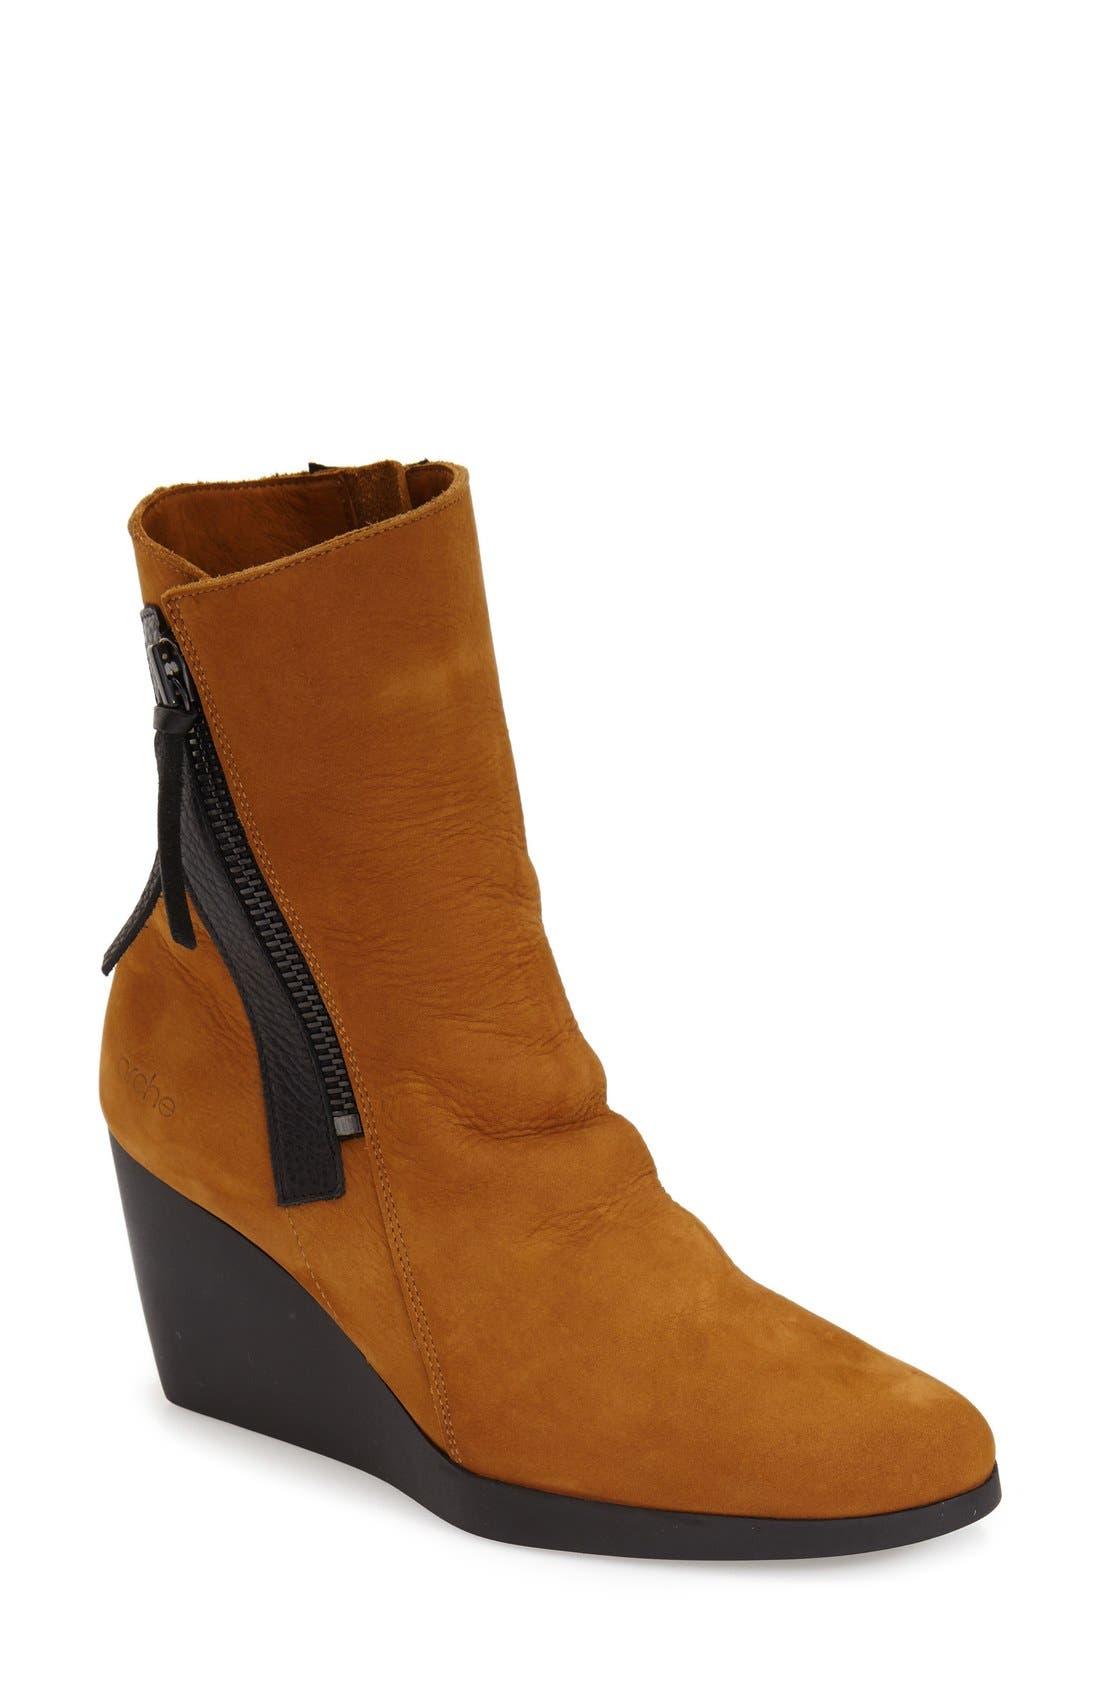 'Vitahe' Water ResistantBoot,                         Main,                         color, Almond Nubuck Leather